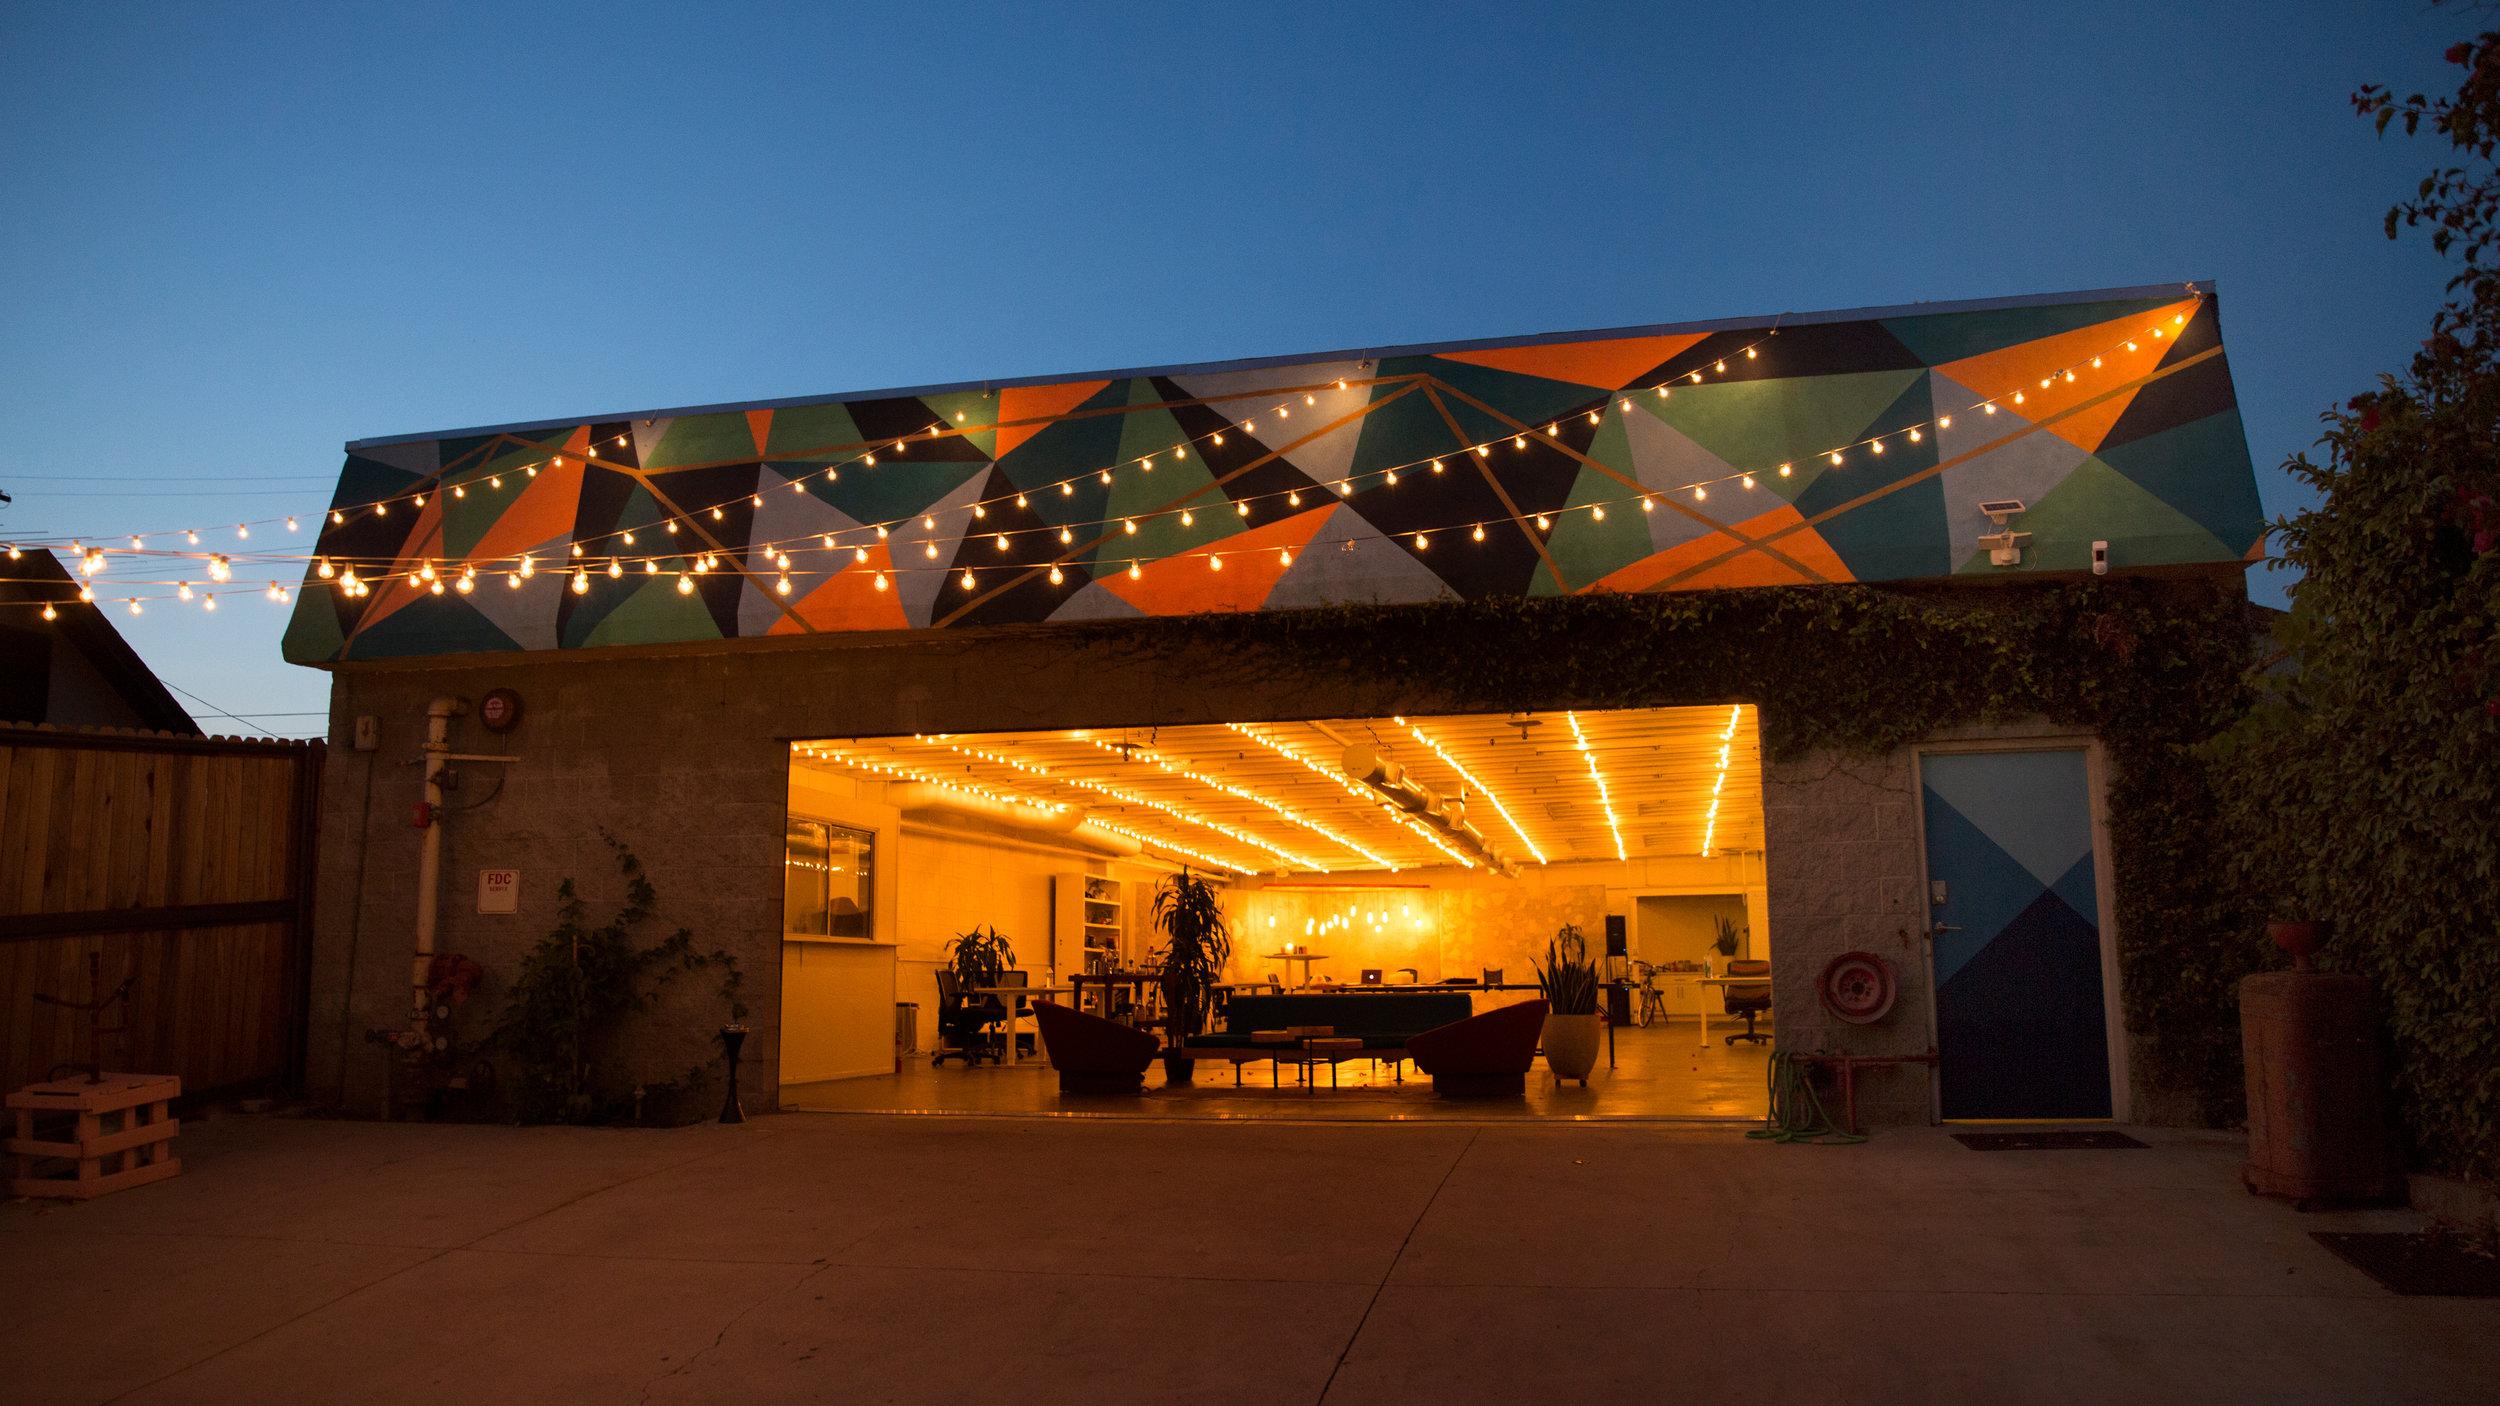 garage_deck_mural.jpg